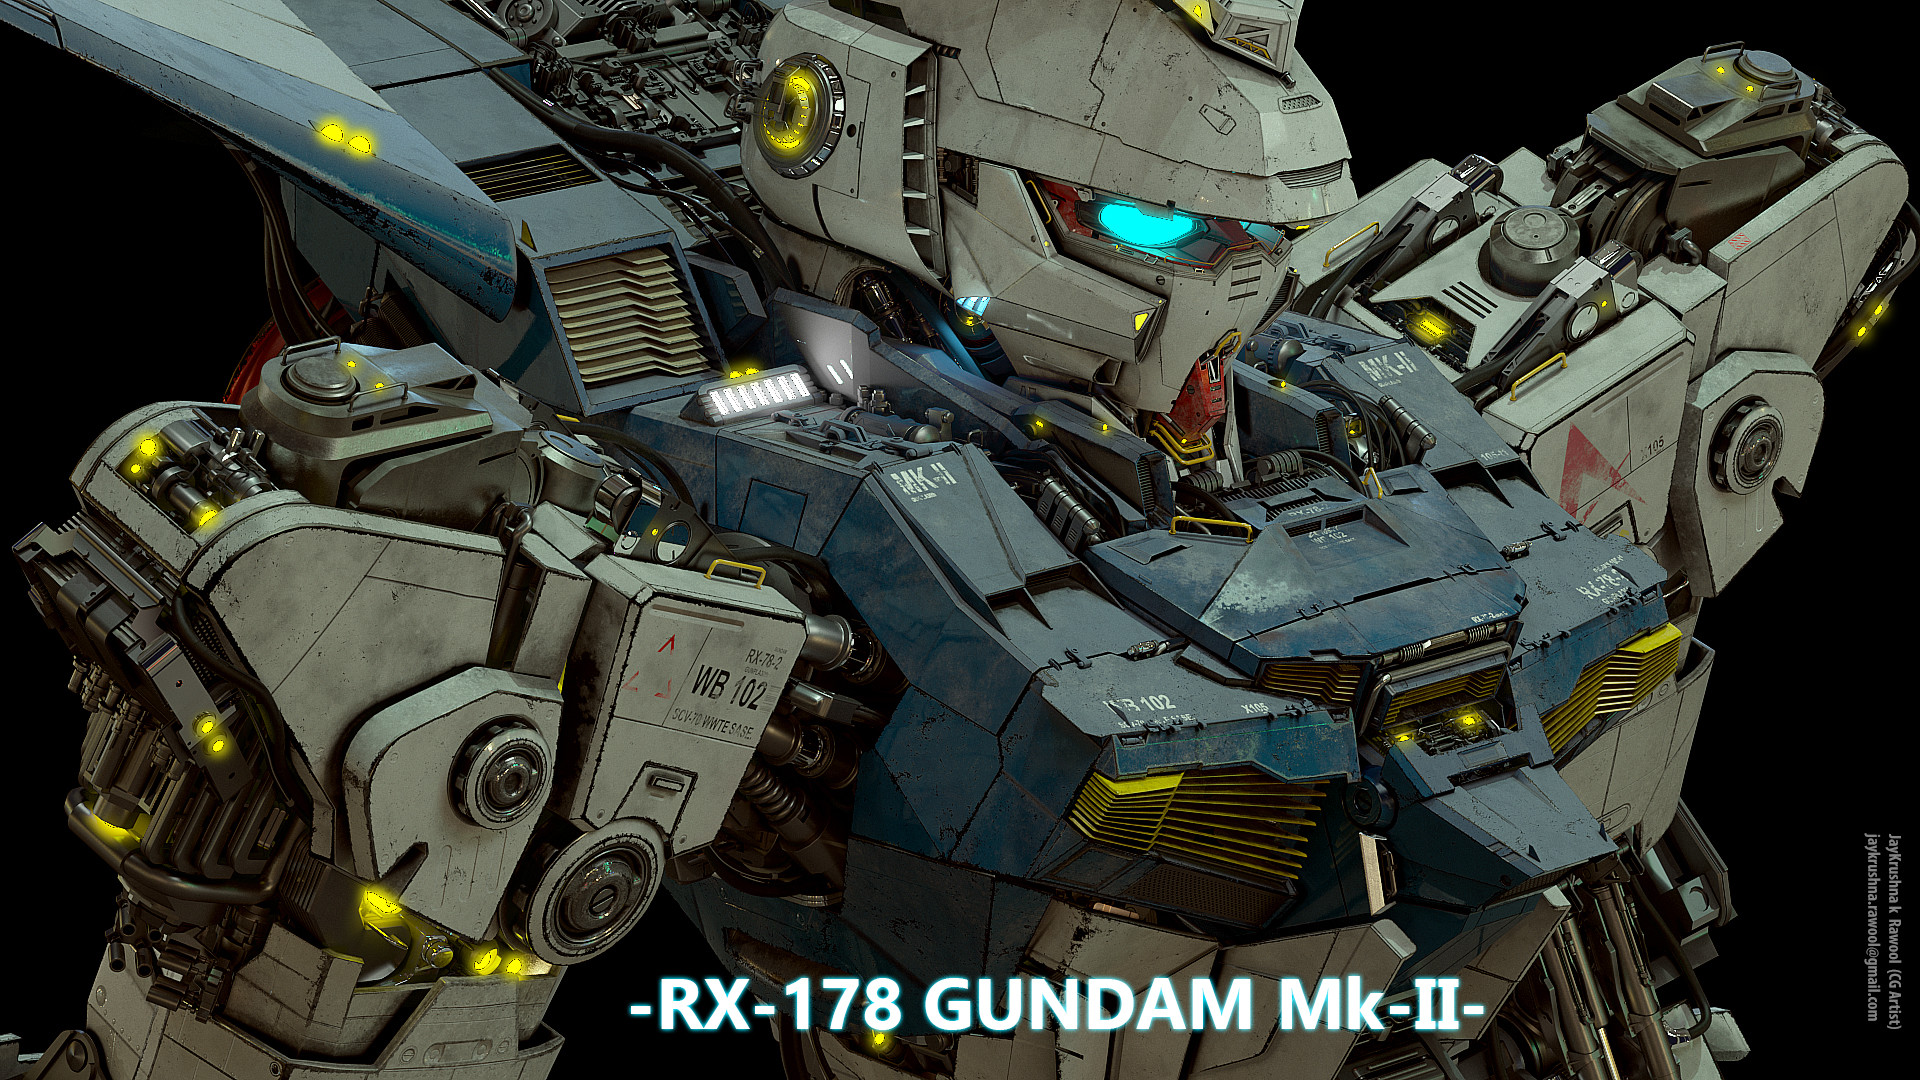 Hd Images For Mobile Wallpaper Artstation Gundam Combat Mobile Suit Custom Build Rx